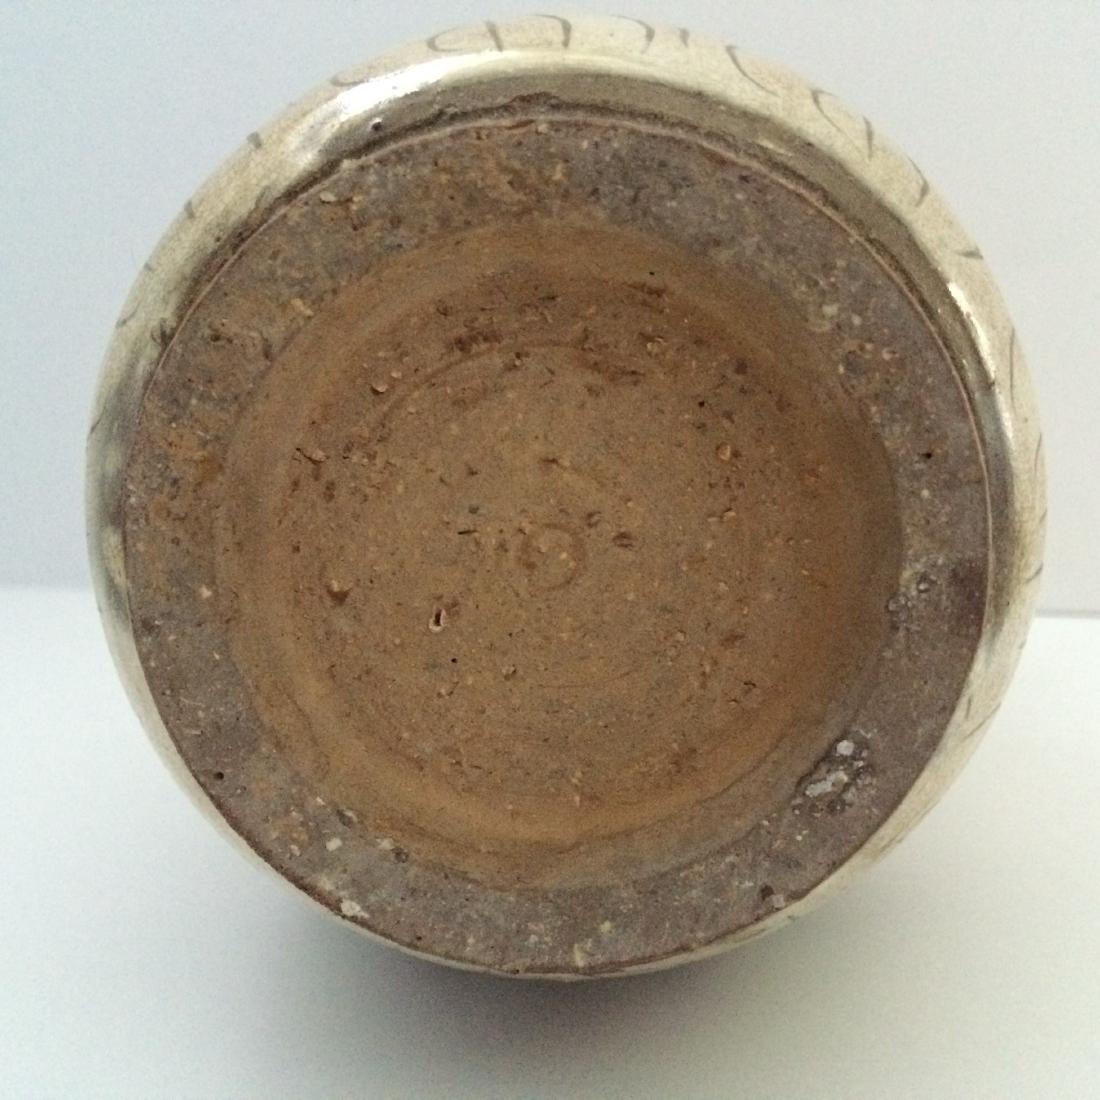 "Chinese Liao Dynasty Ceramic Ci Zhou Ware Pitcher 10""H - 6"